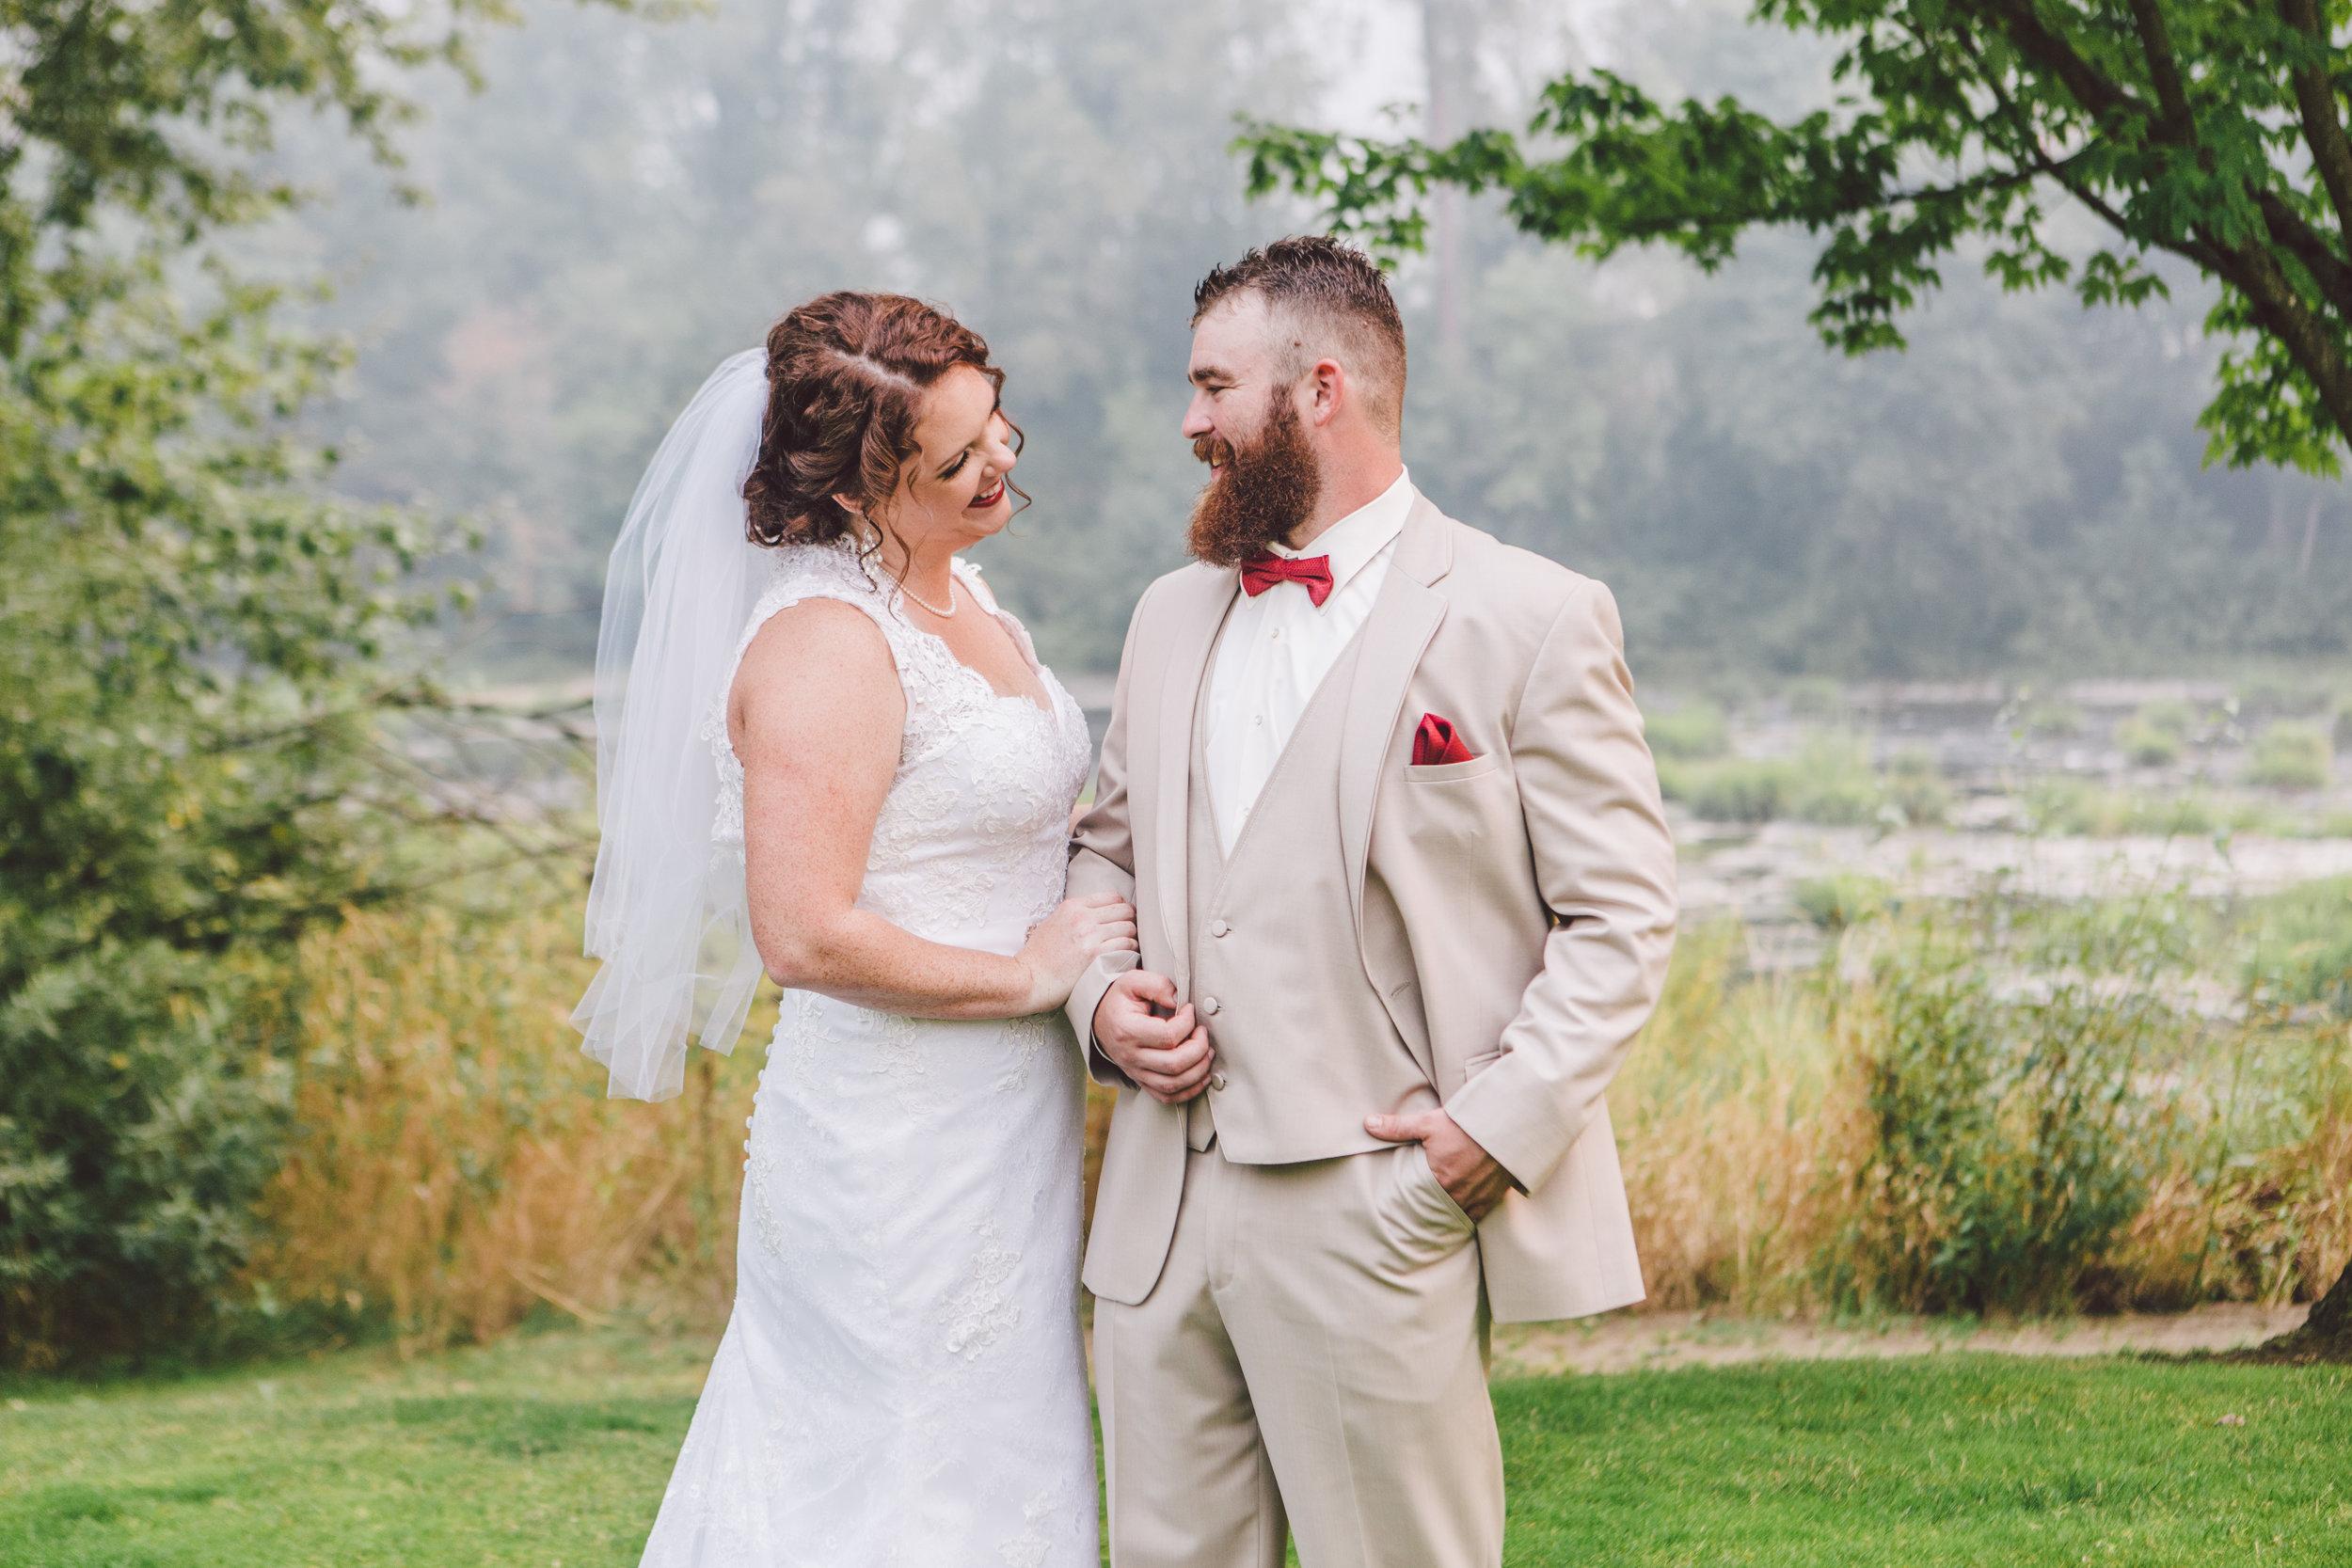 Kincheloe_Hutchings Wedding 2017 (355).jpg